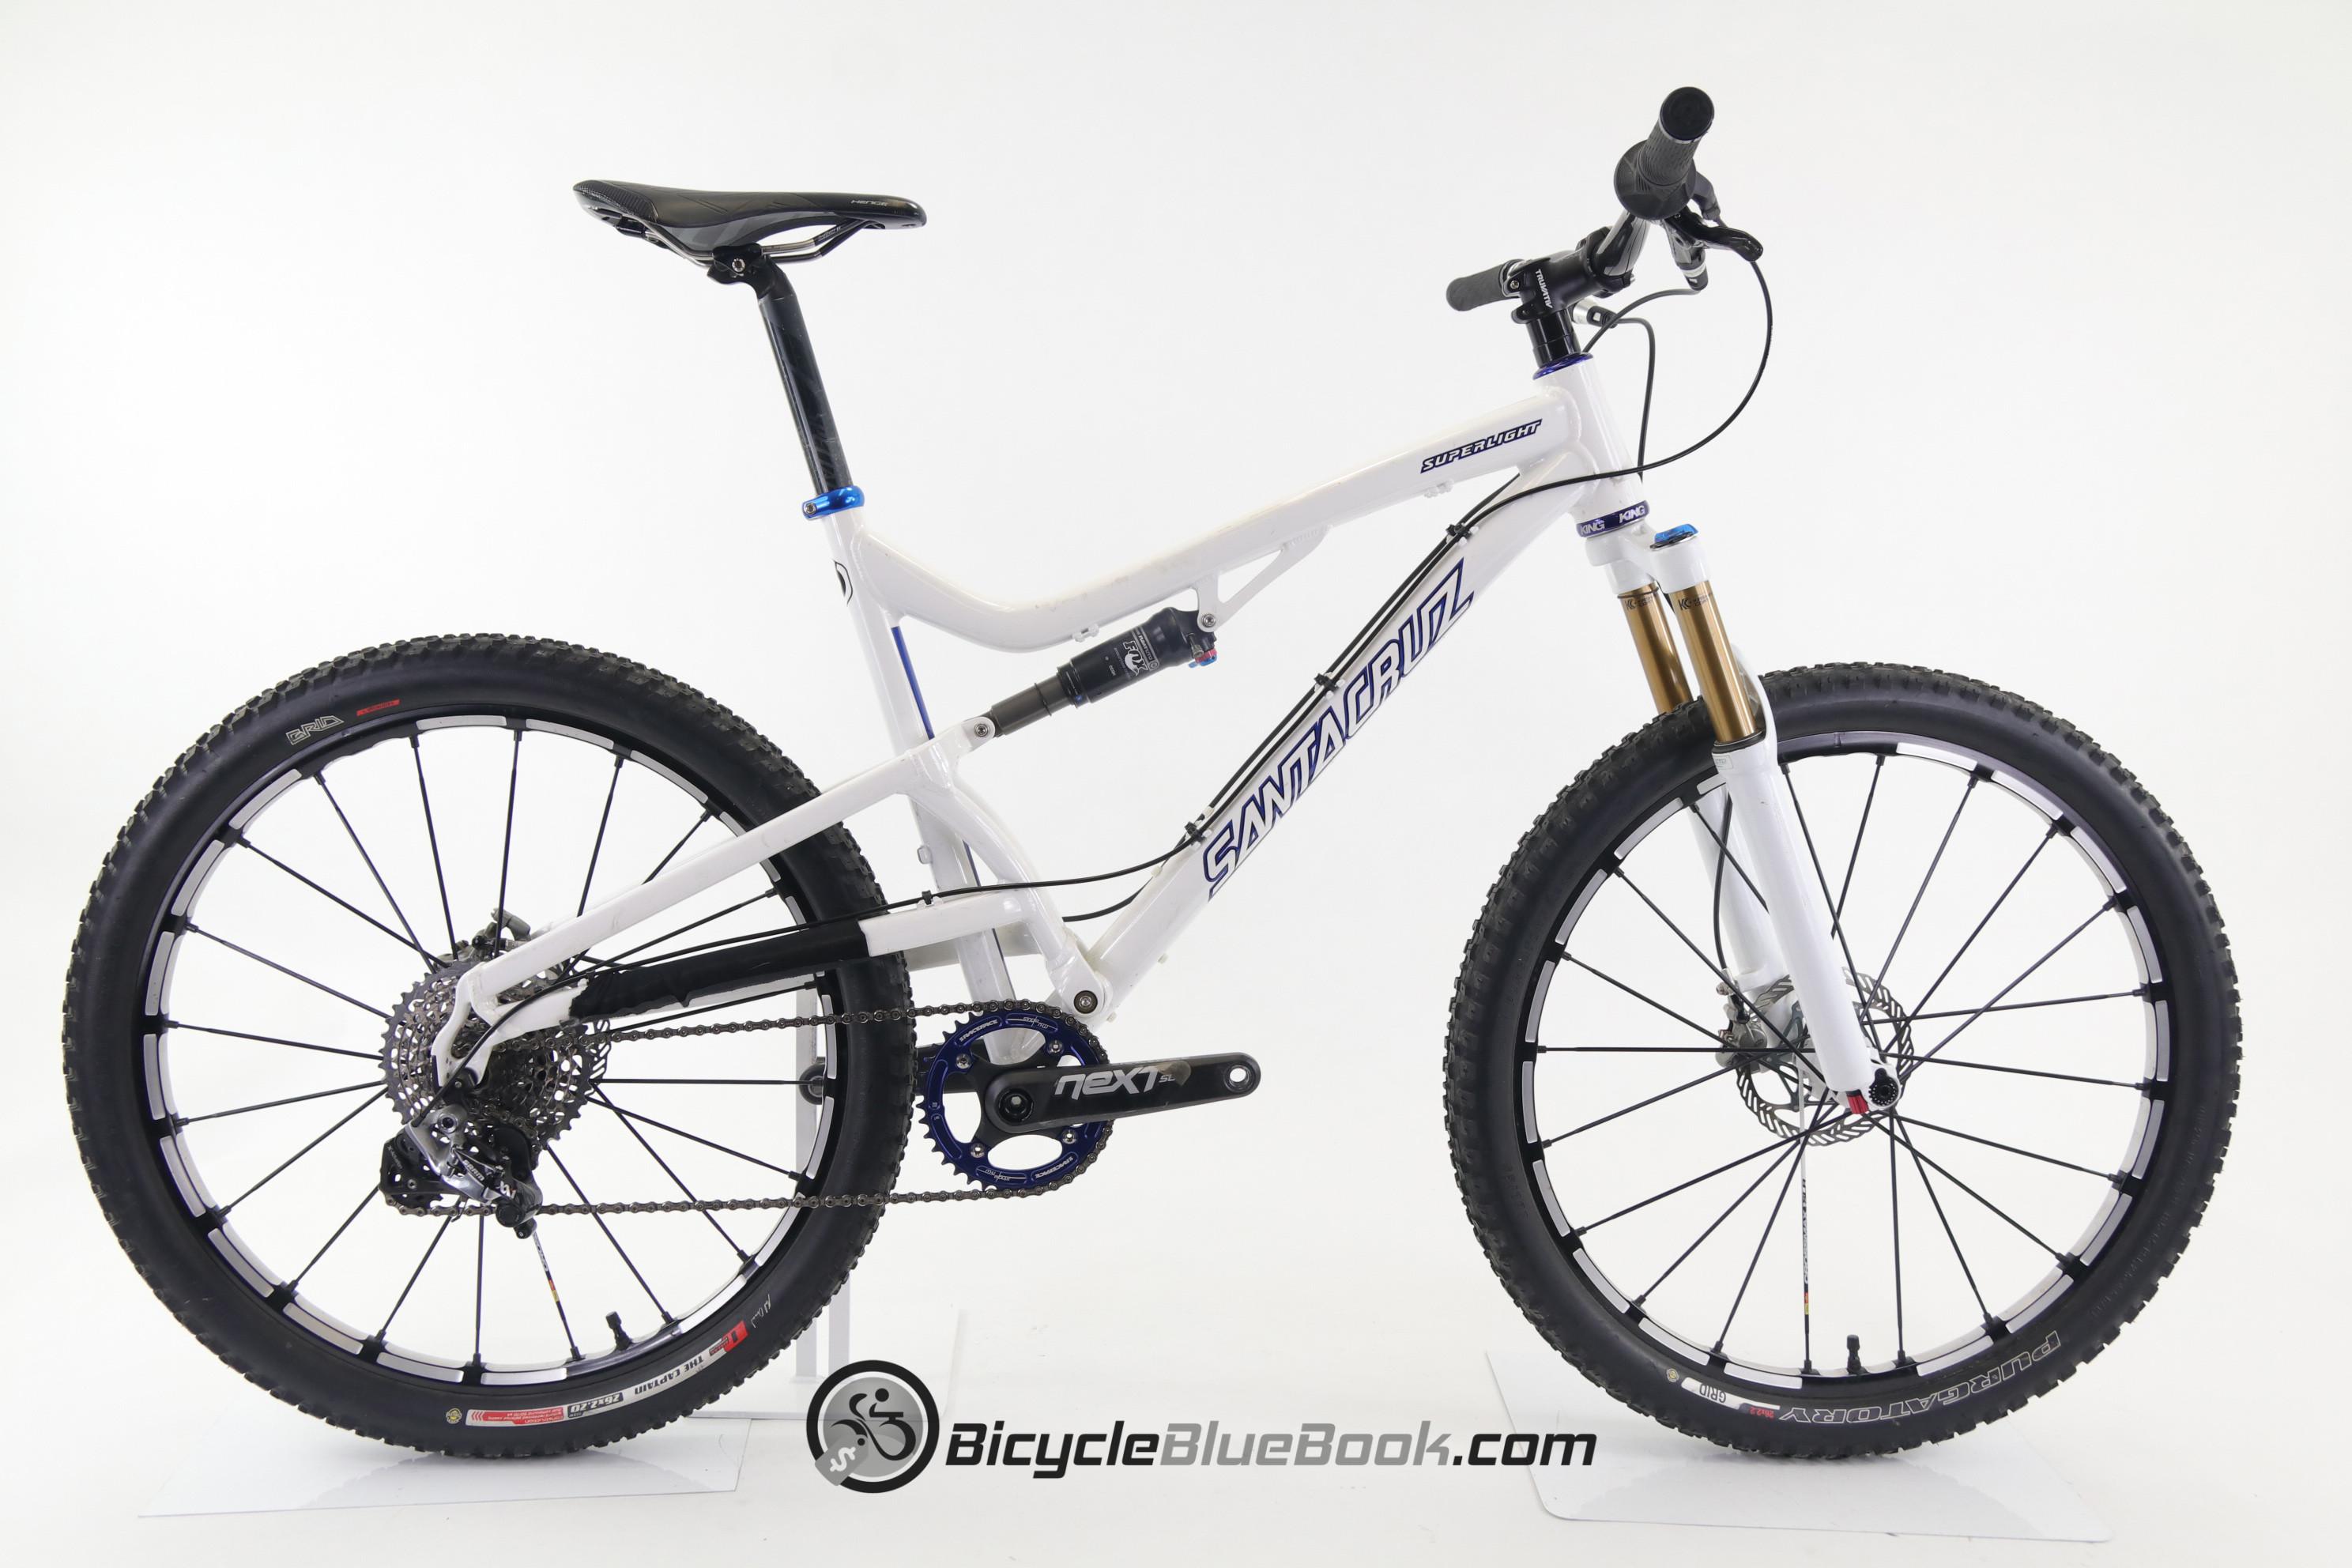 Santa Cruz Superlight Custom For Sale - 2253 - BicycleBlueBook.com